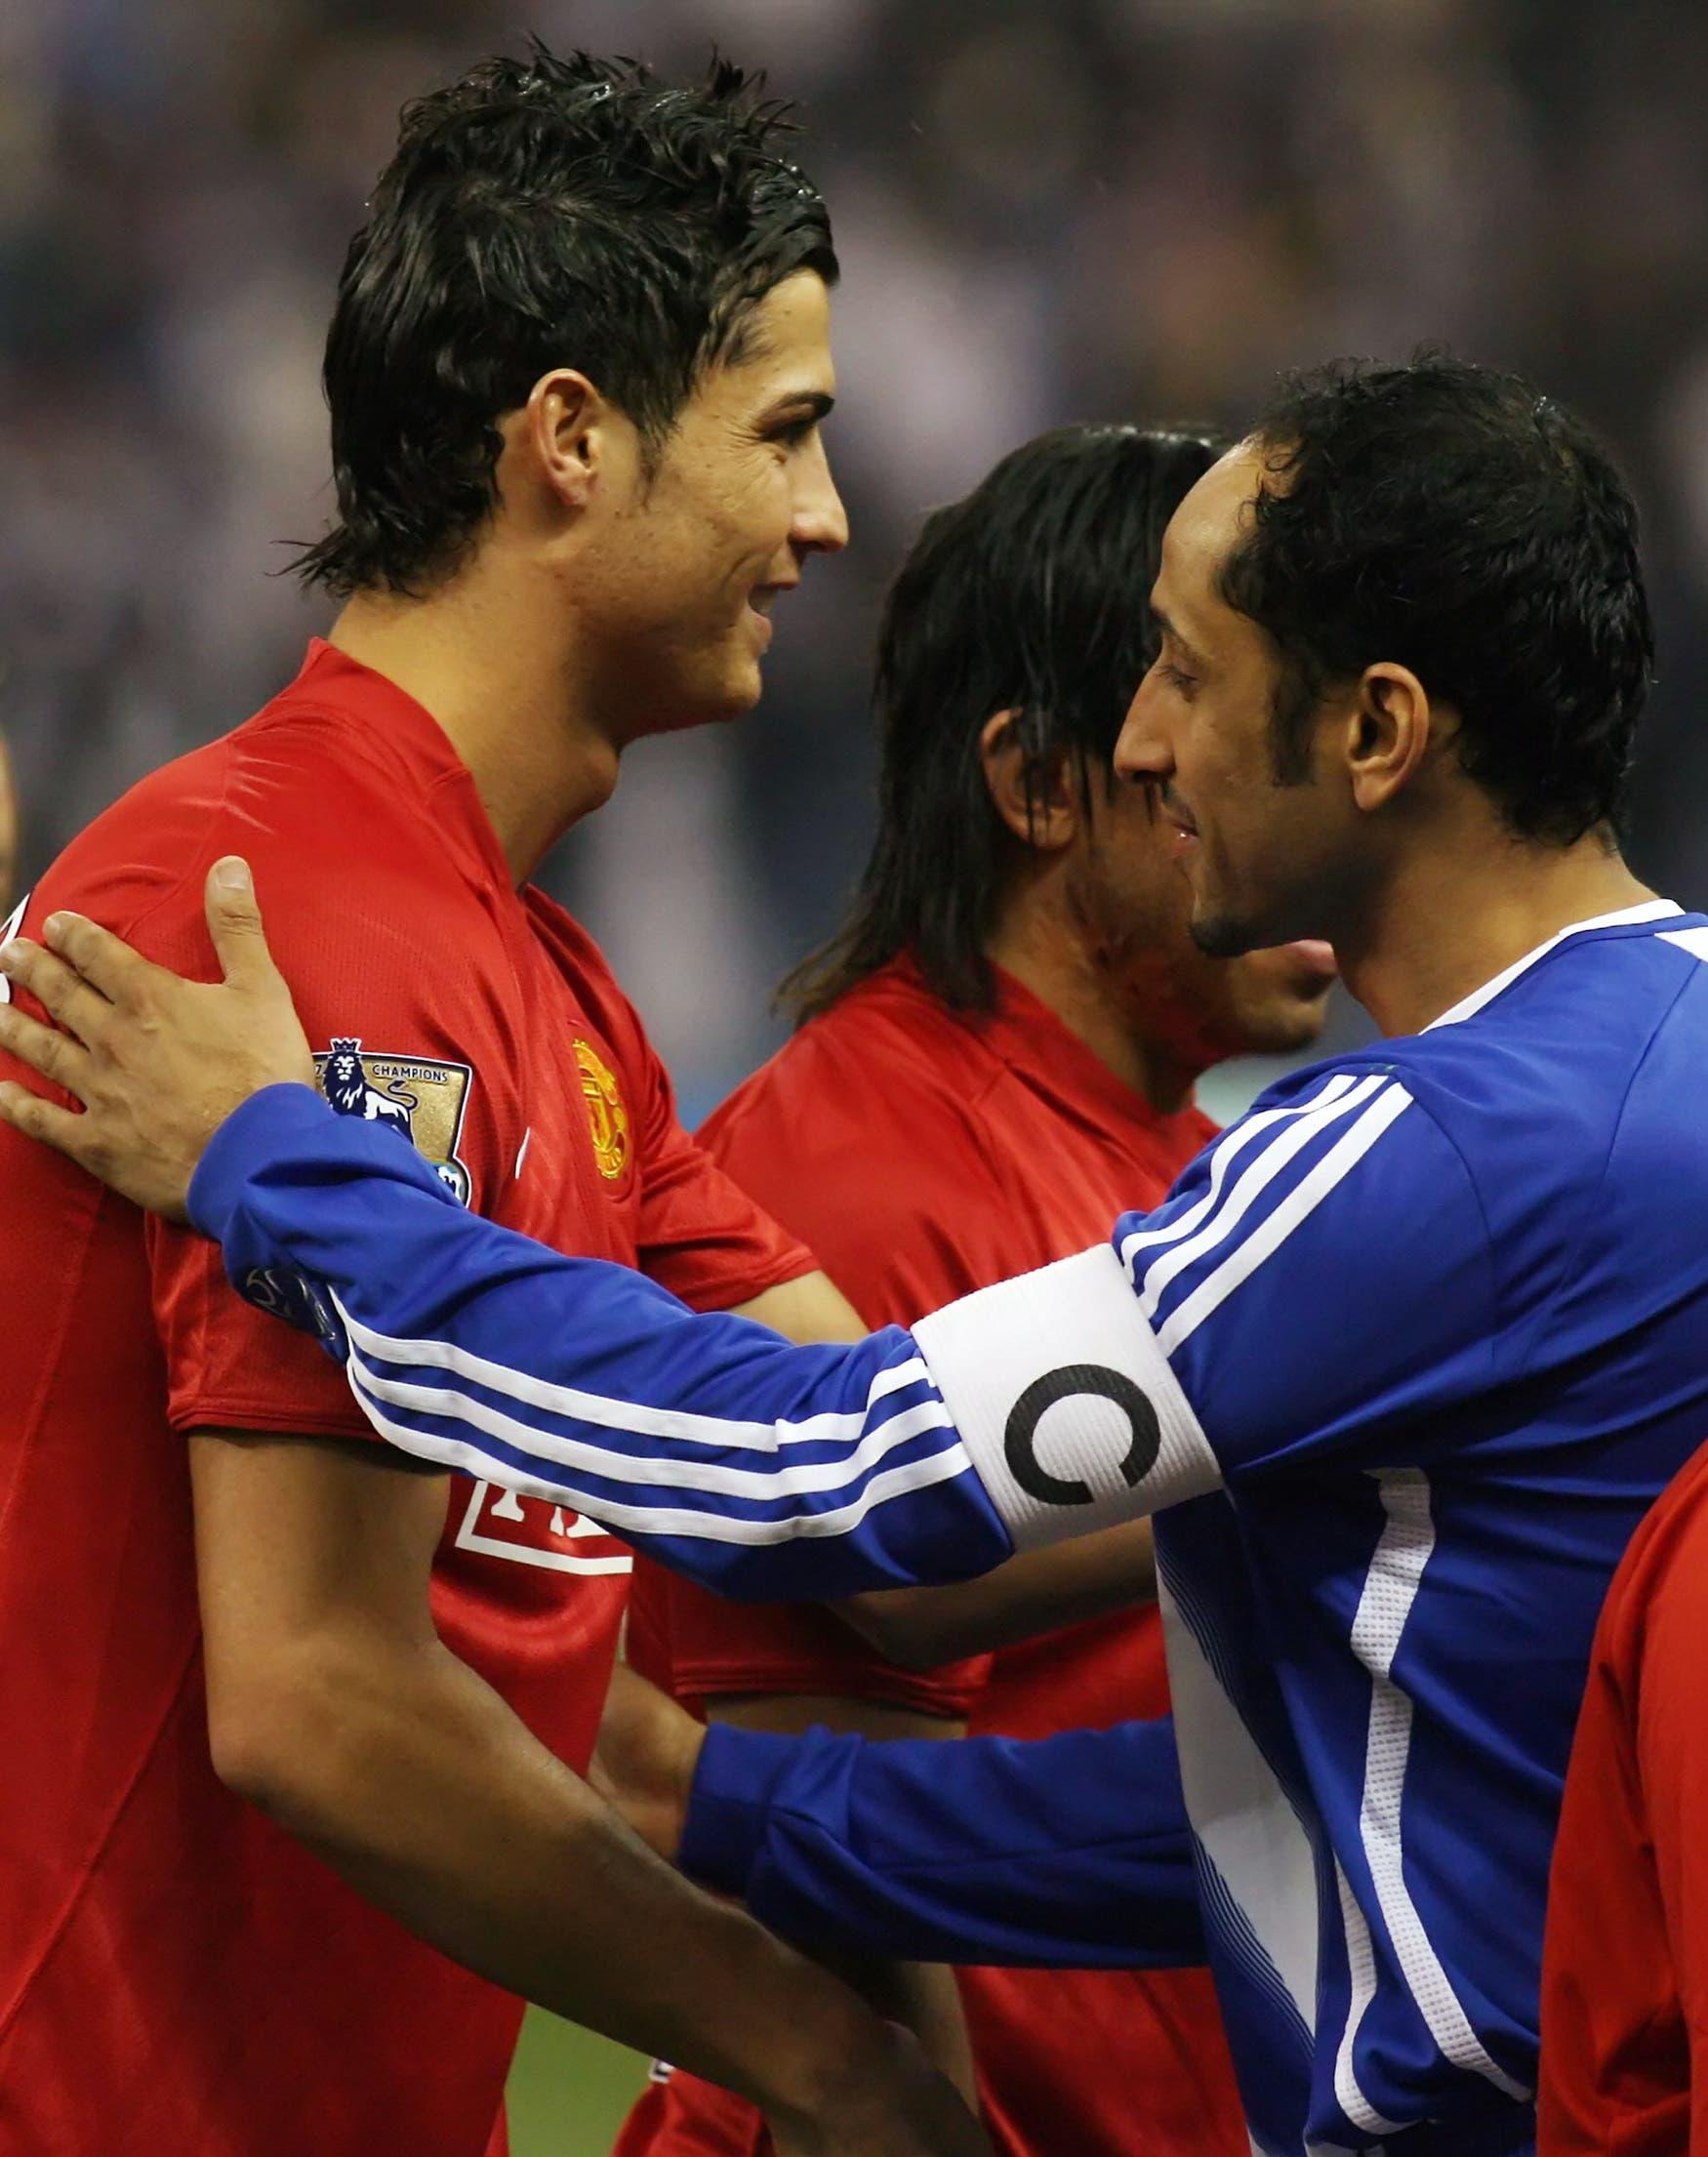 رونالدو مع سامي الجابر